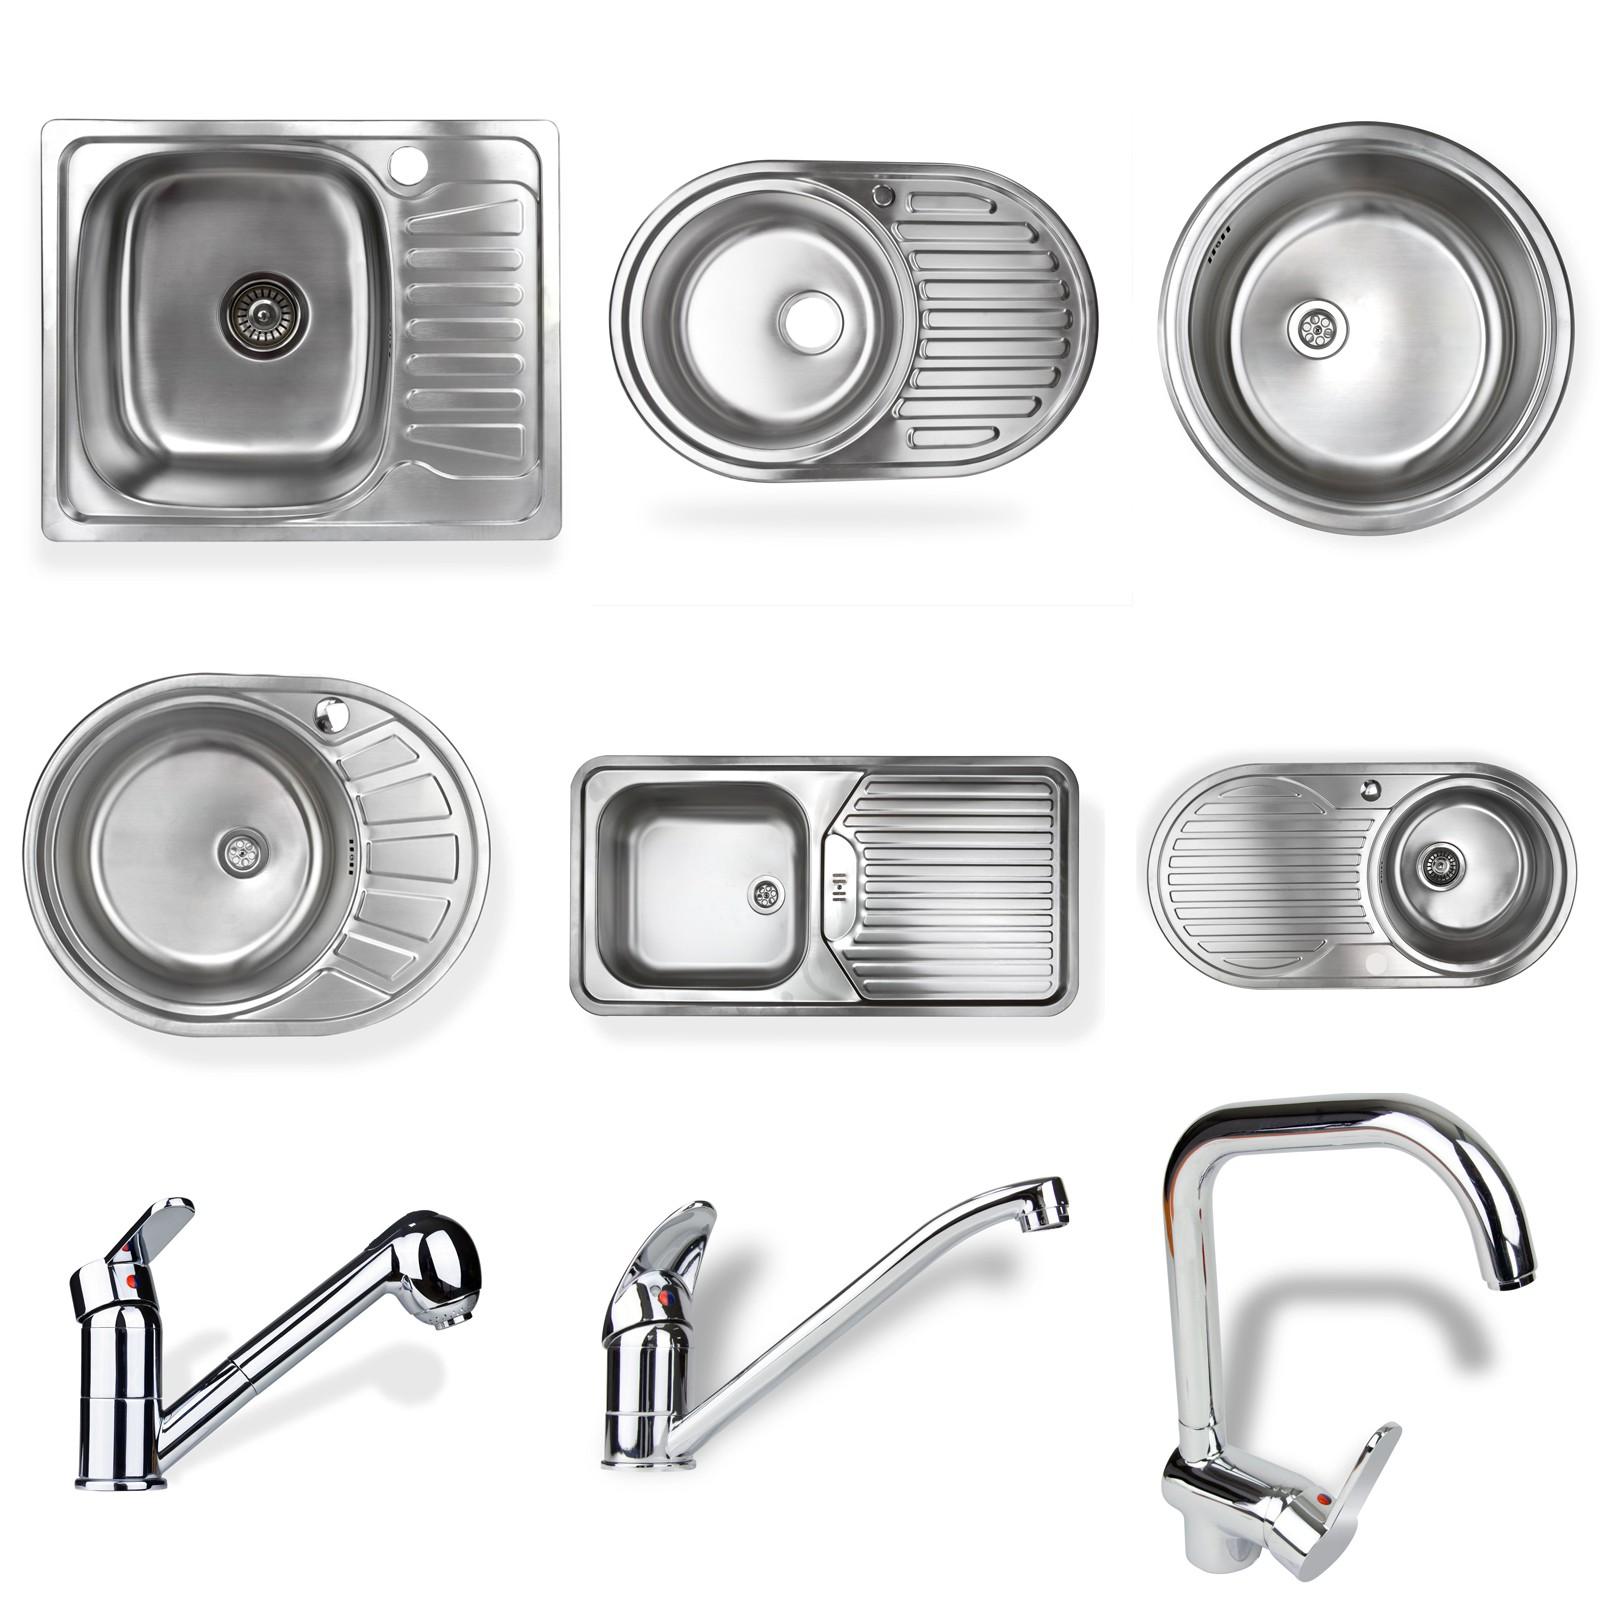 edelstahl einbausp le k chensp le k chenarmatur wasserhahn bad windsheim. Black Bedroom Furniture Sets. Home Design Ideas